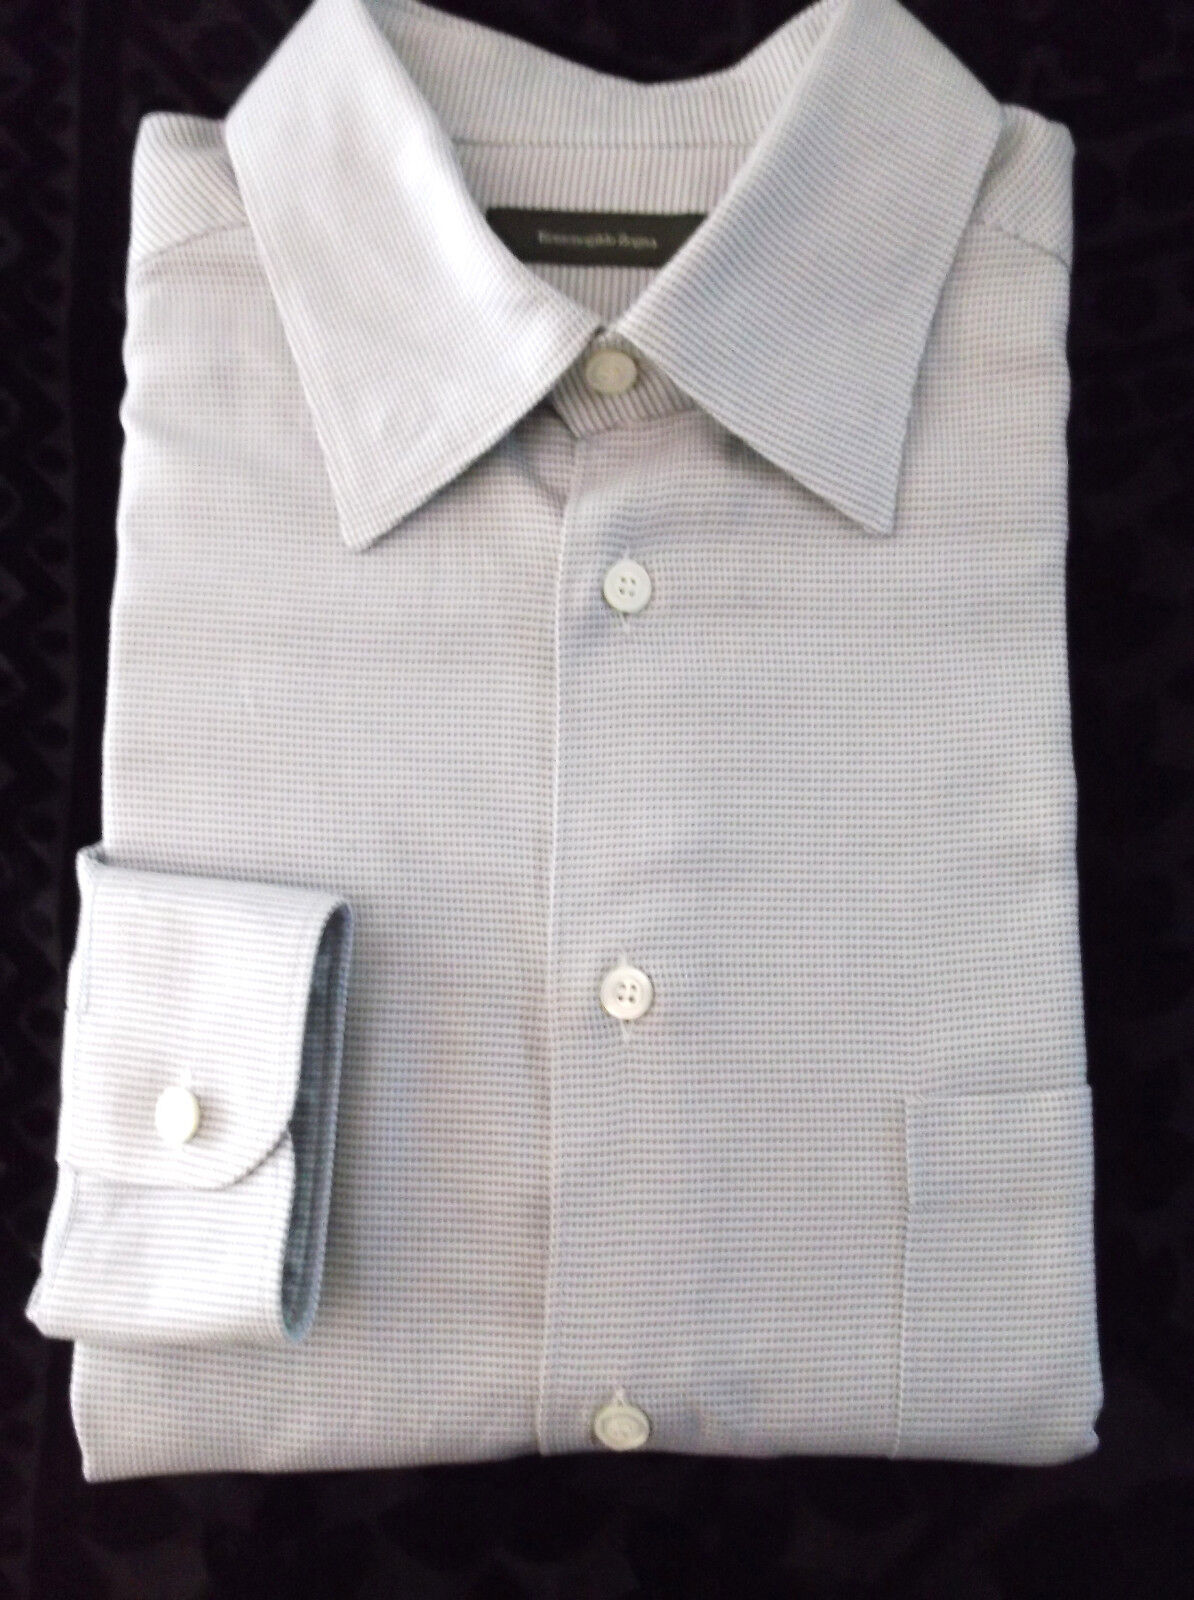 Ermenegildo Zegna Beige and Braun Dot Shirt Made in Itlay  Größe XL Button Down